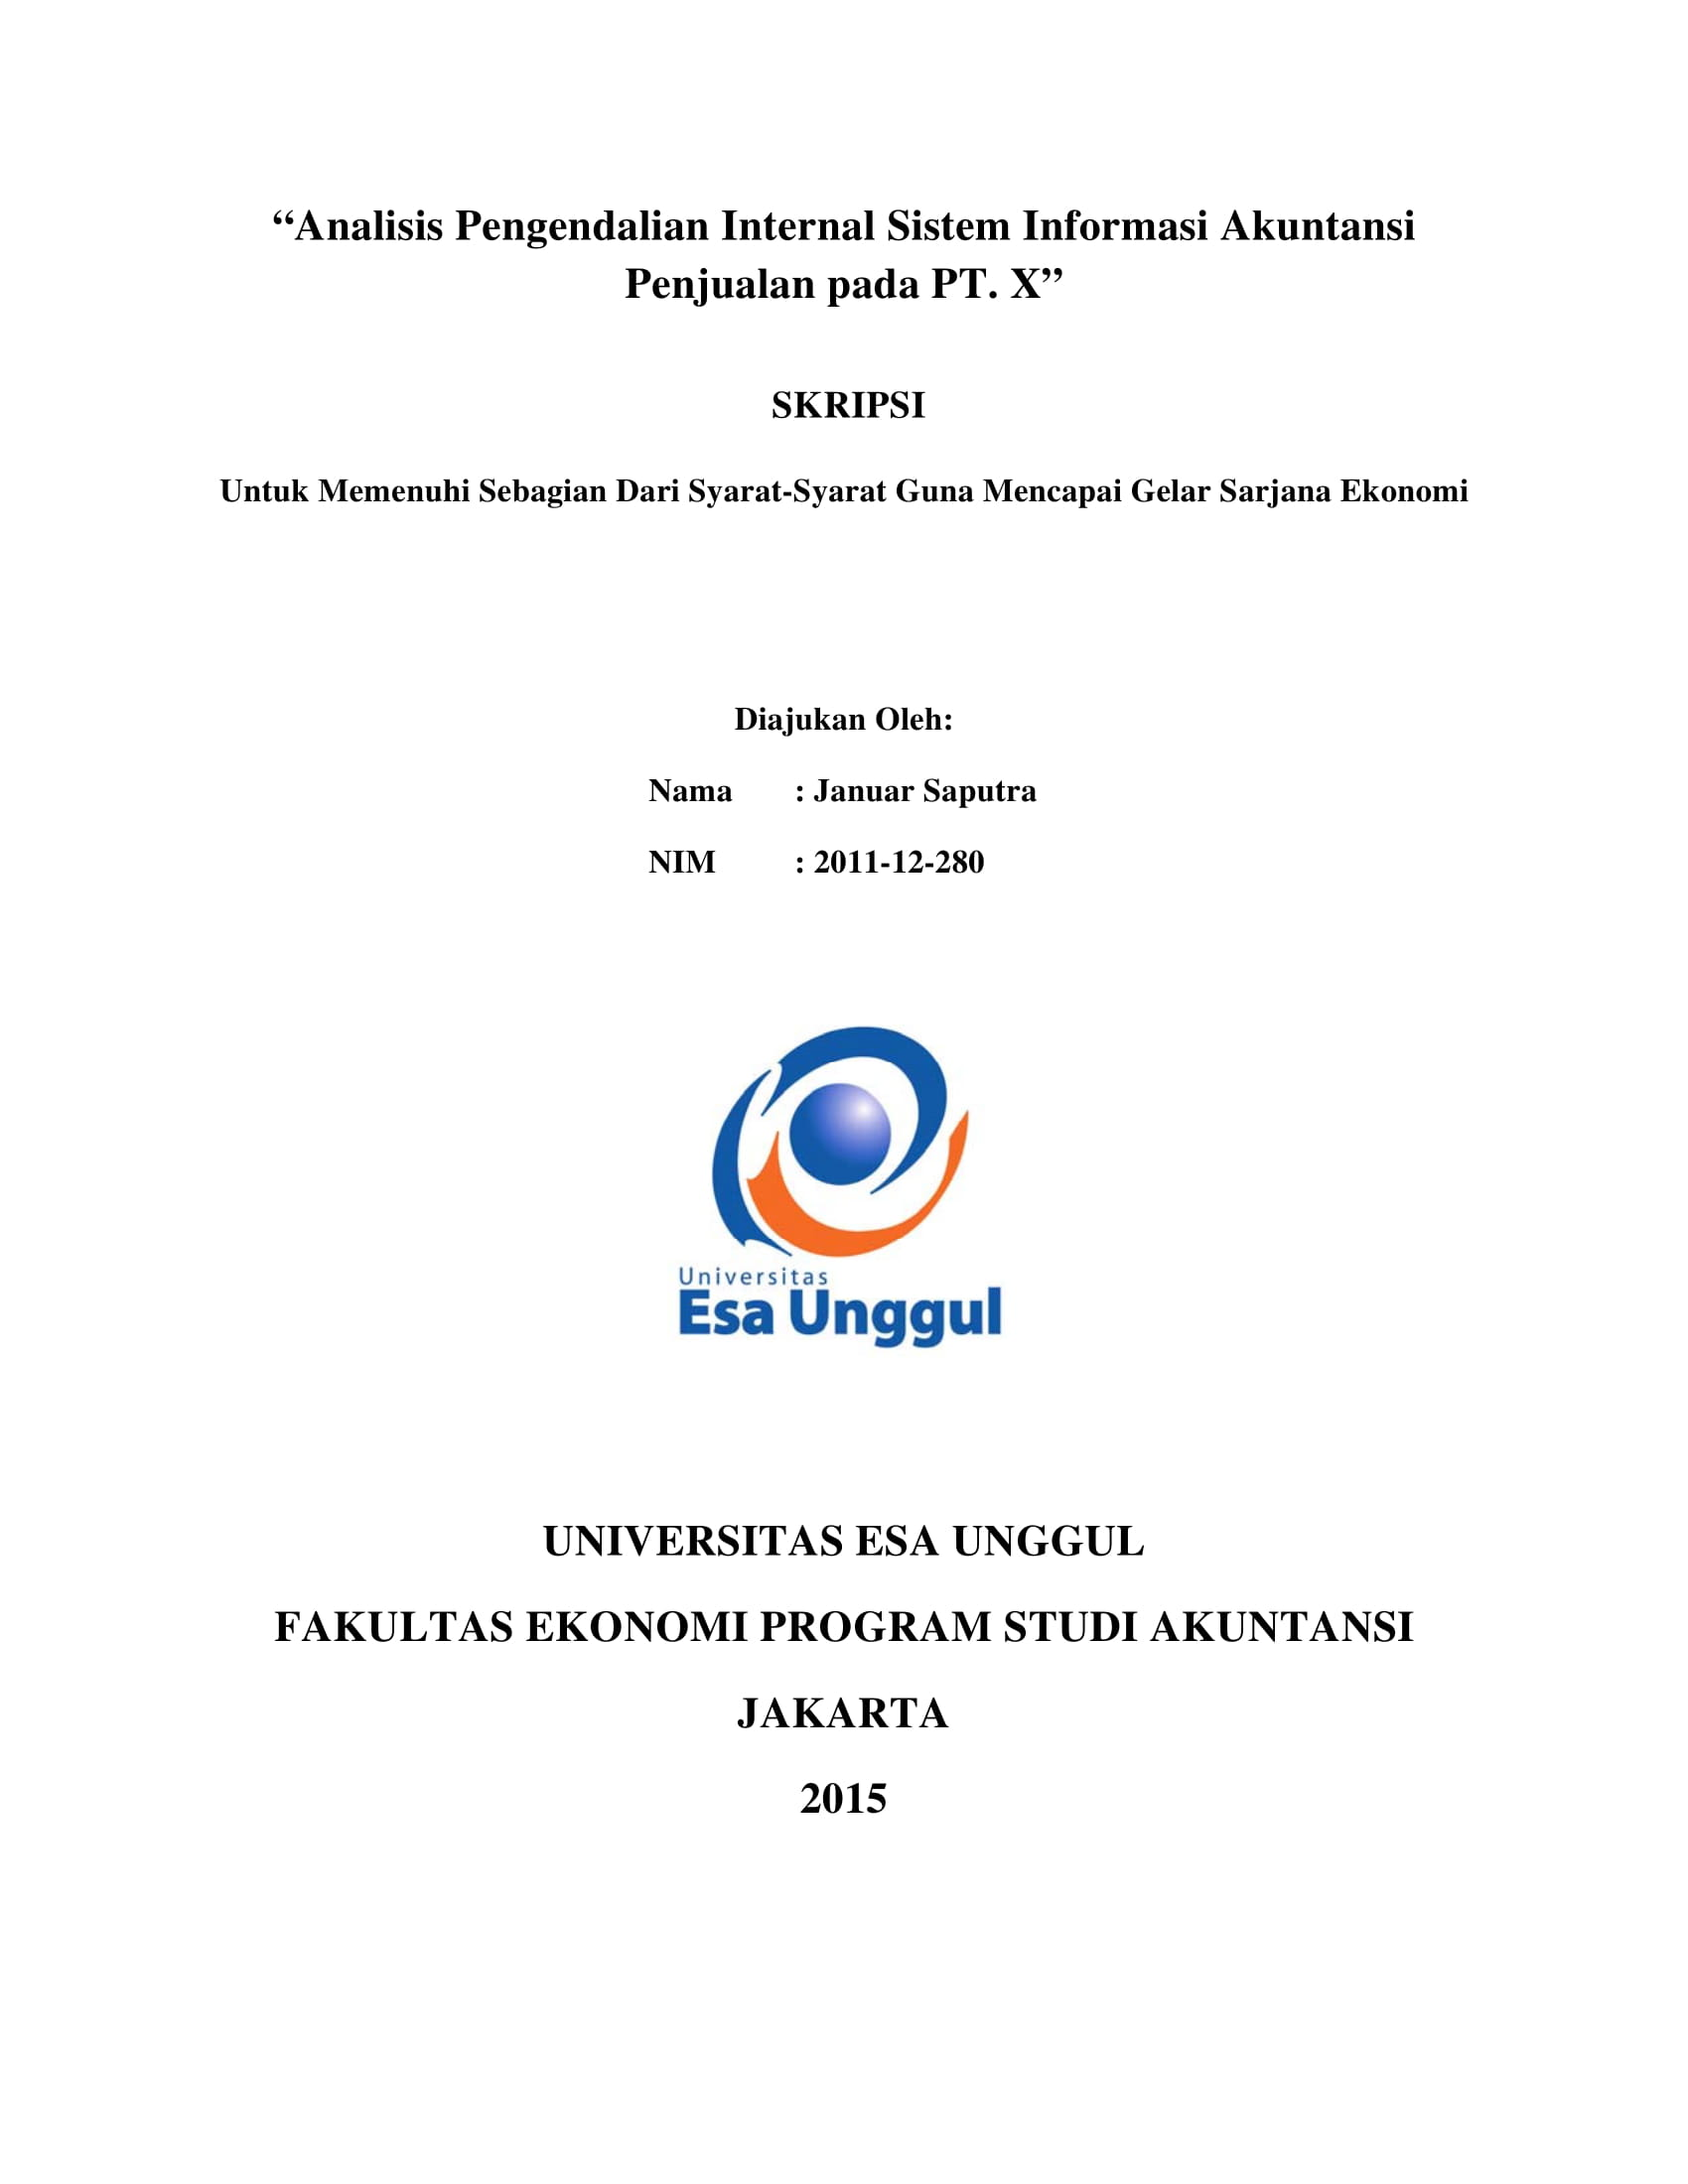 Analisis Pengendalian Internal Sistem Informasi Akuntansi Penjualan pada PT. X